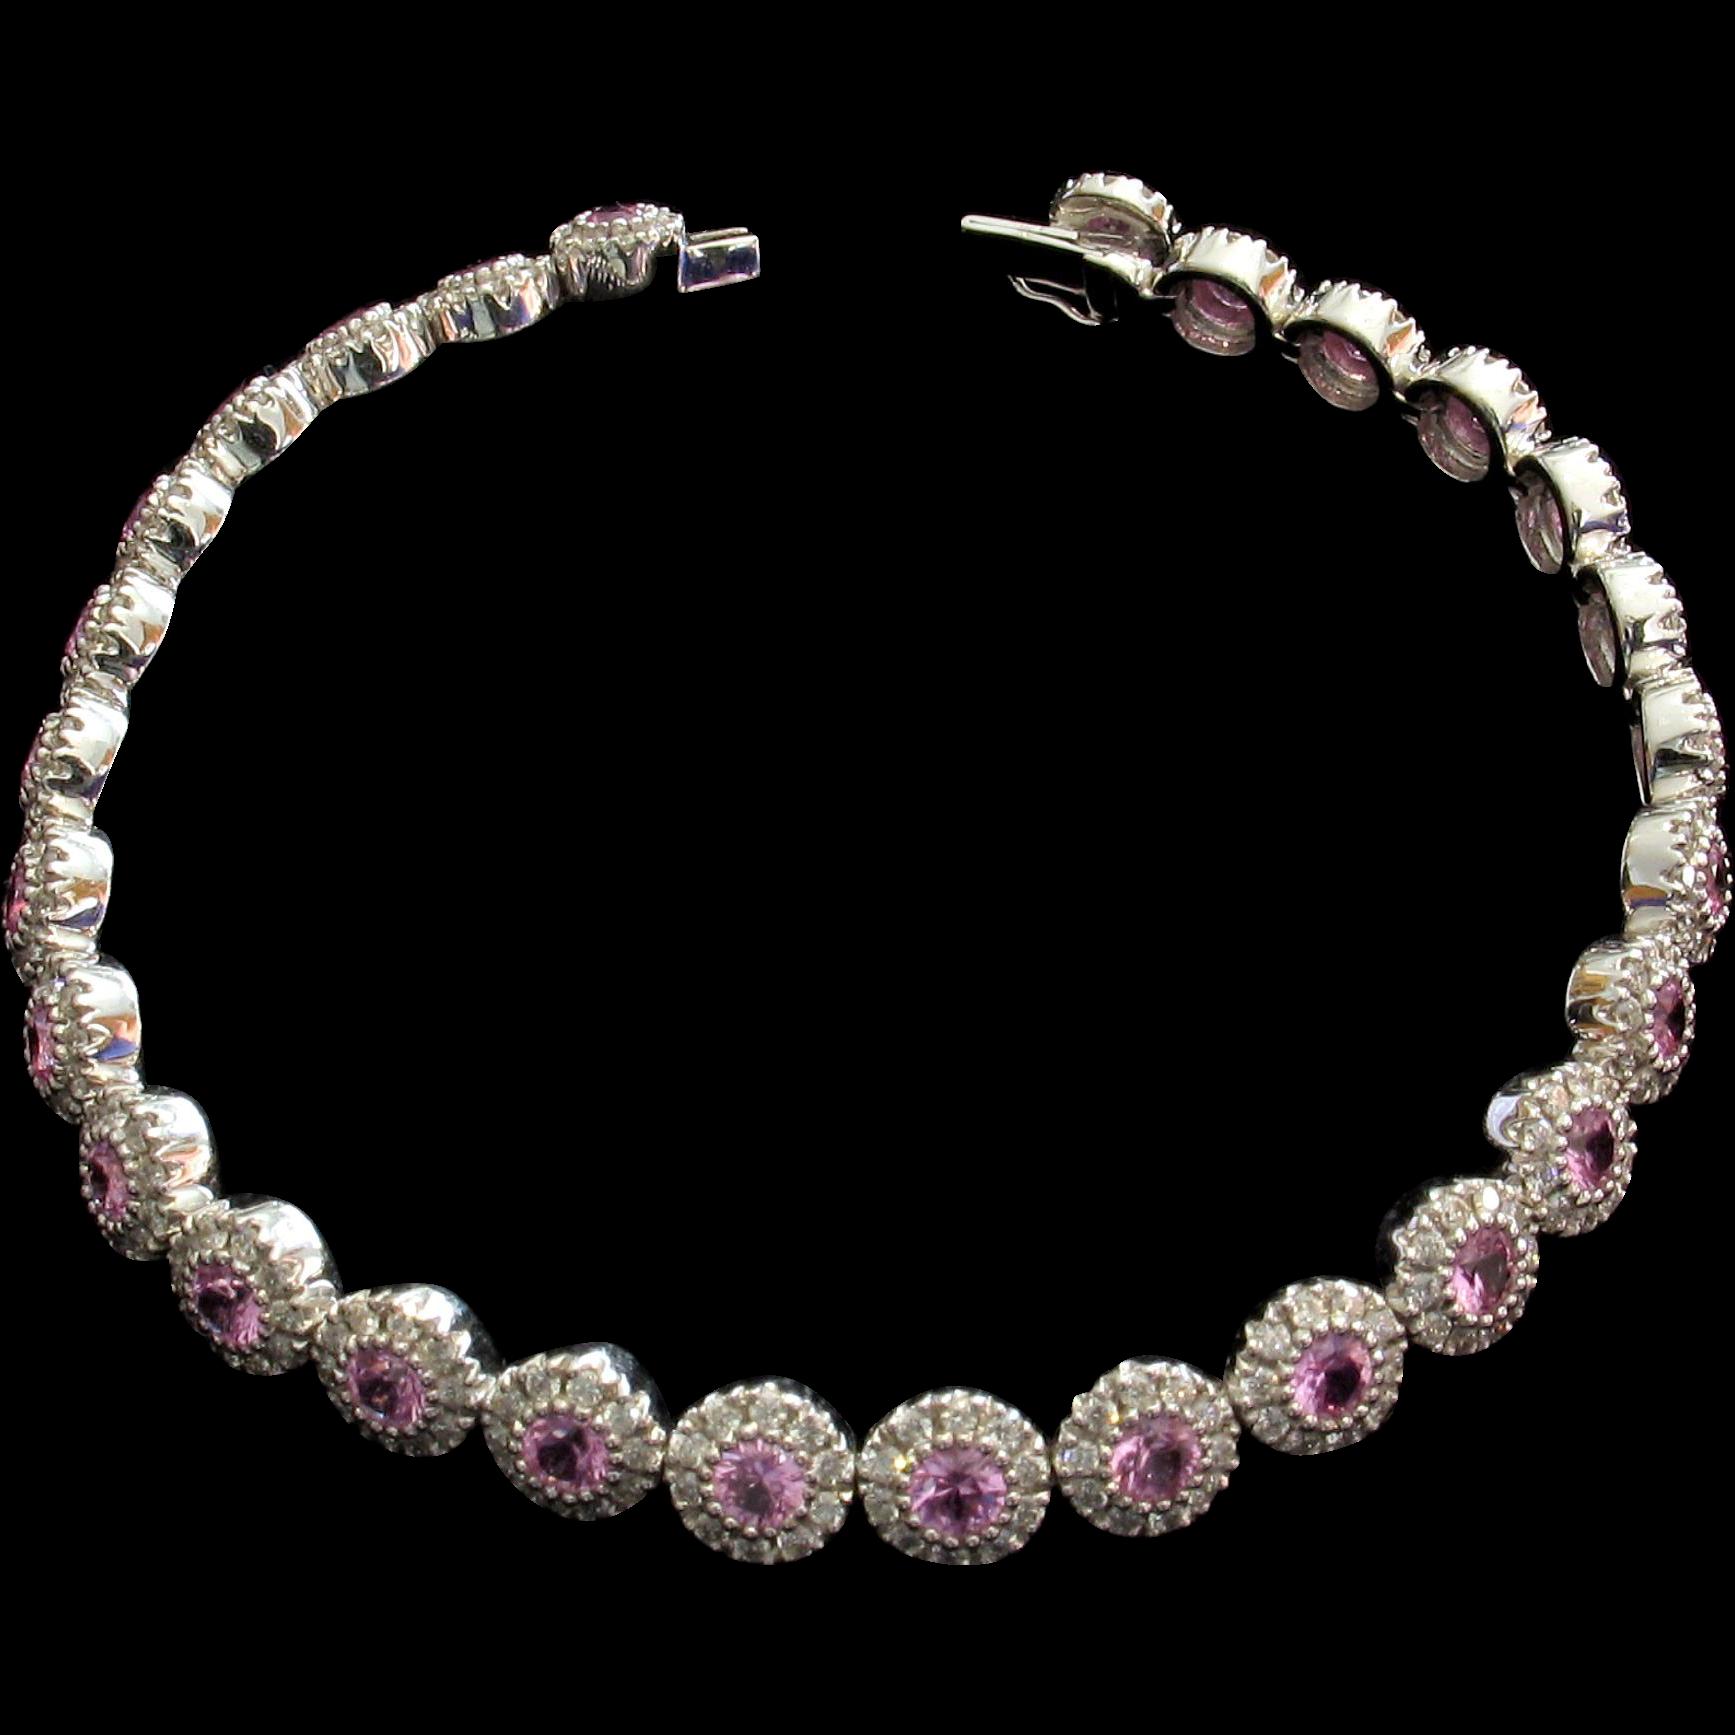 SAVE $500 in our SUPER SUMMER SALE! 5.46ctw Pink Sapphire & Diamond Tennis Bracelet